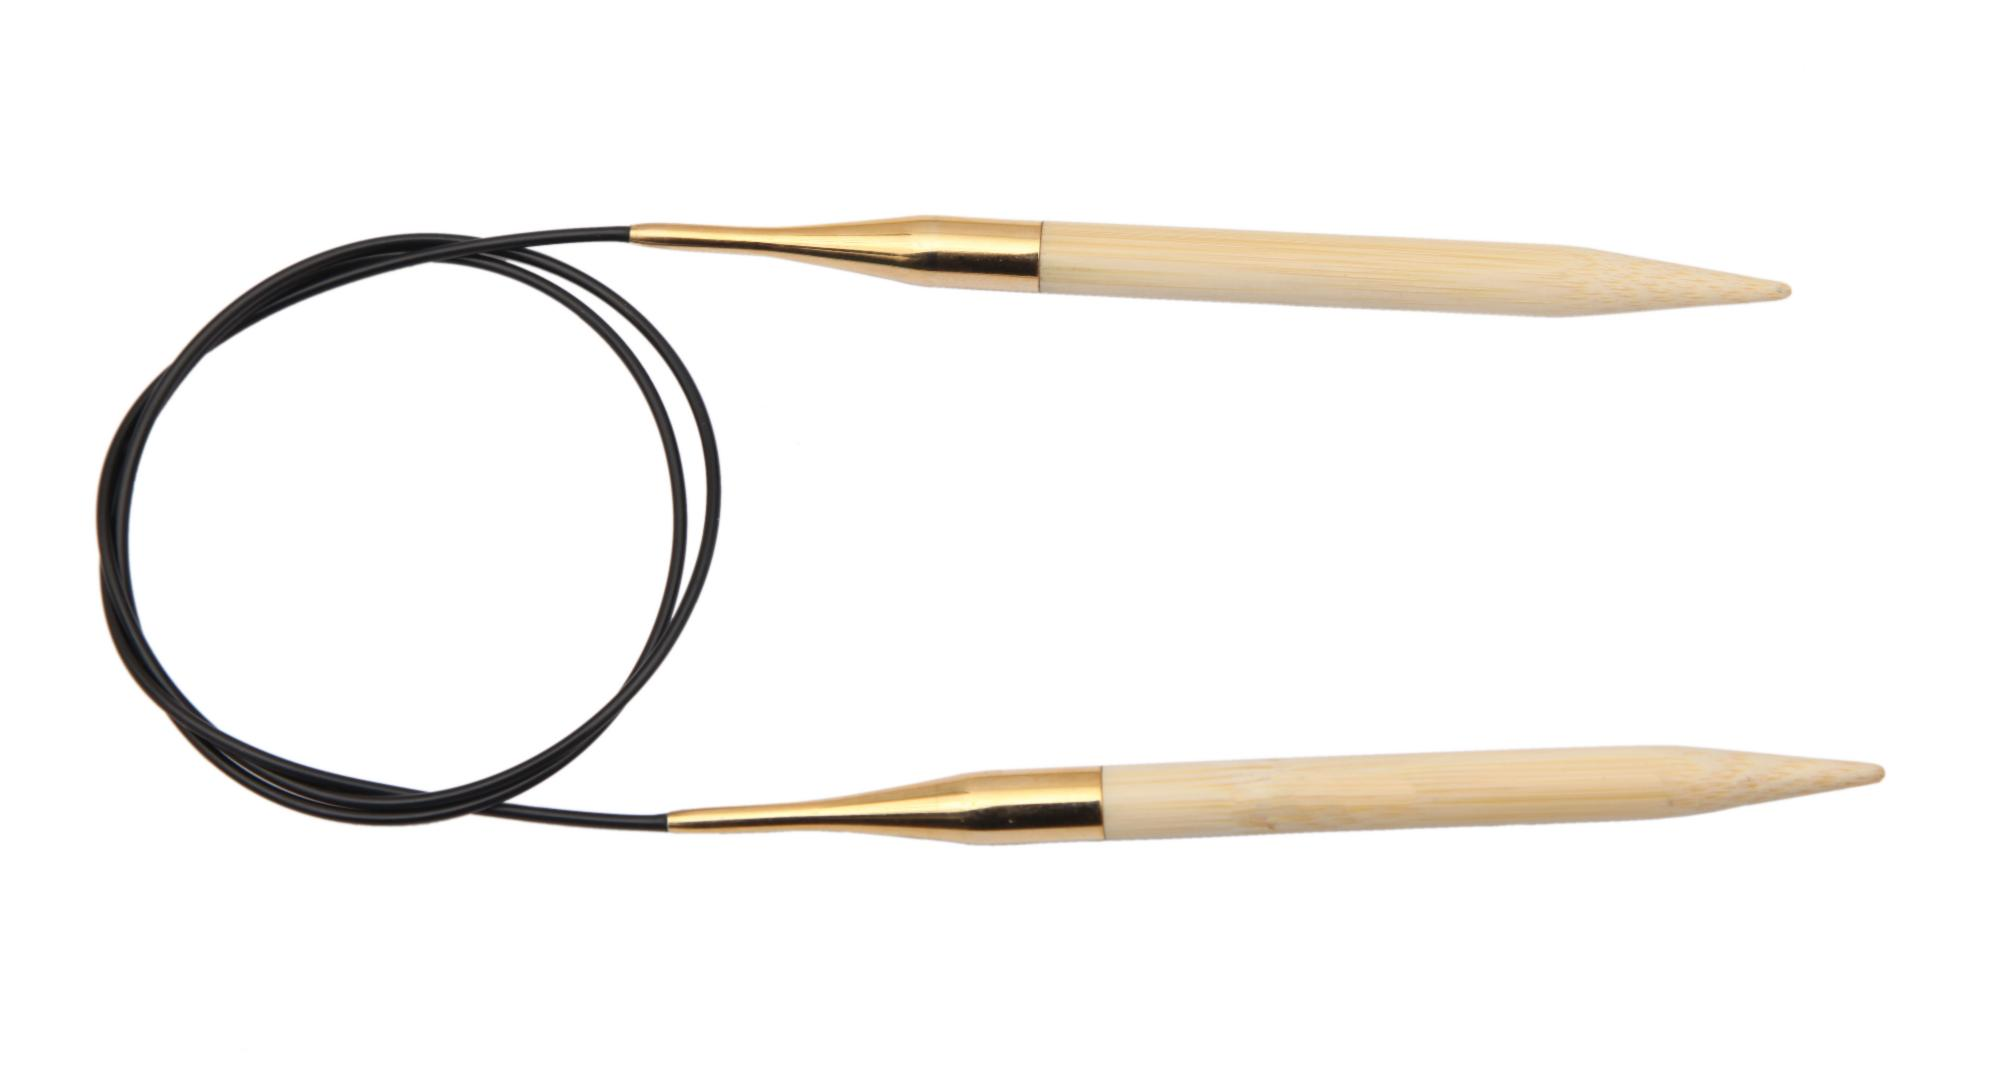 Спицы круговые 40 см Bamboo KnitPro, 22216, 3.75 мм